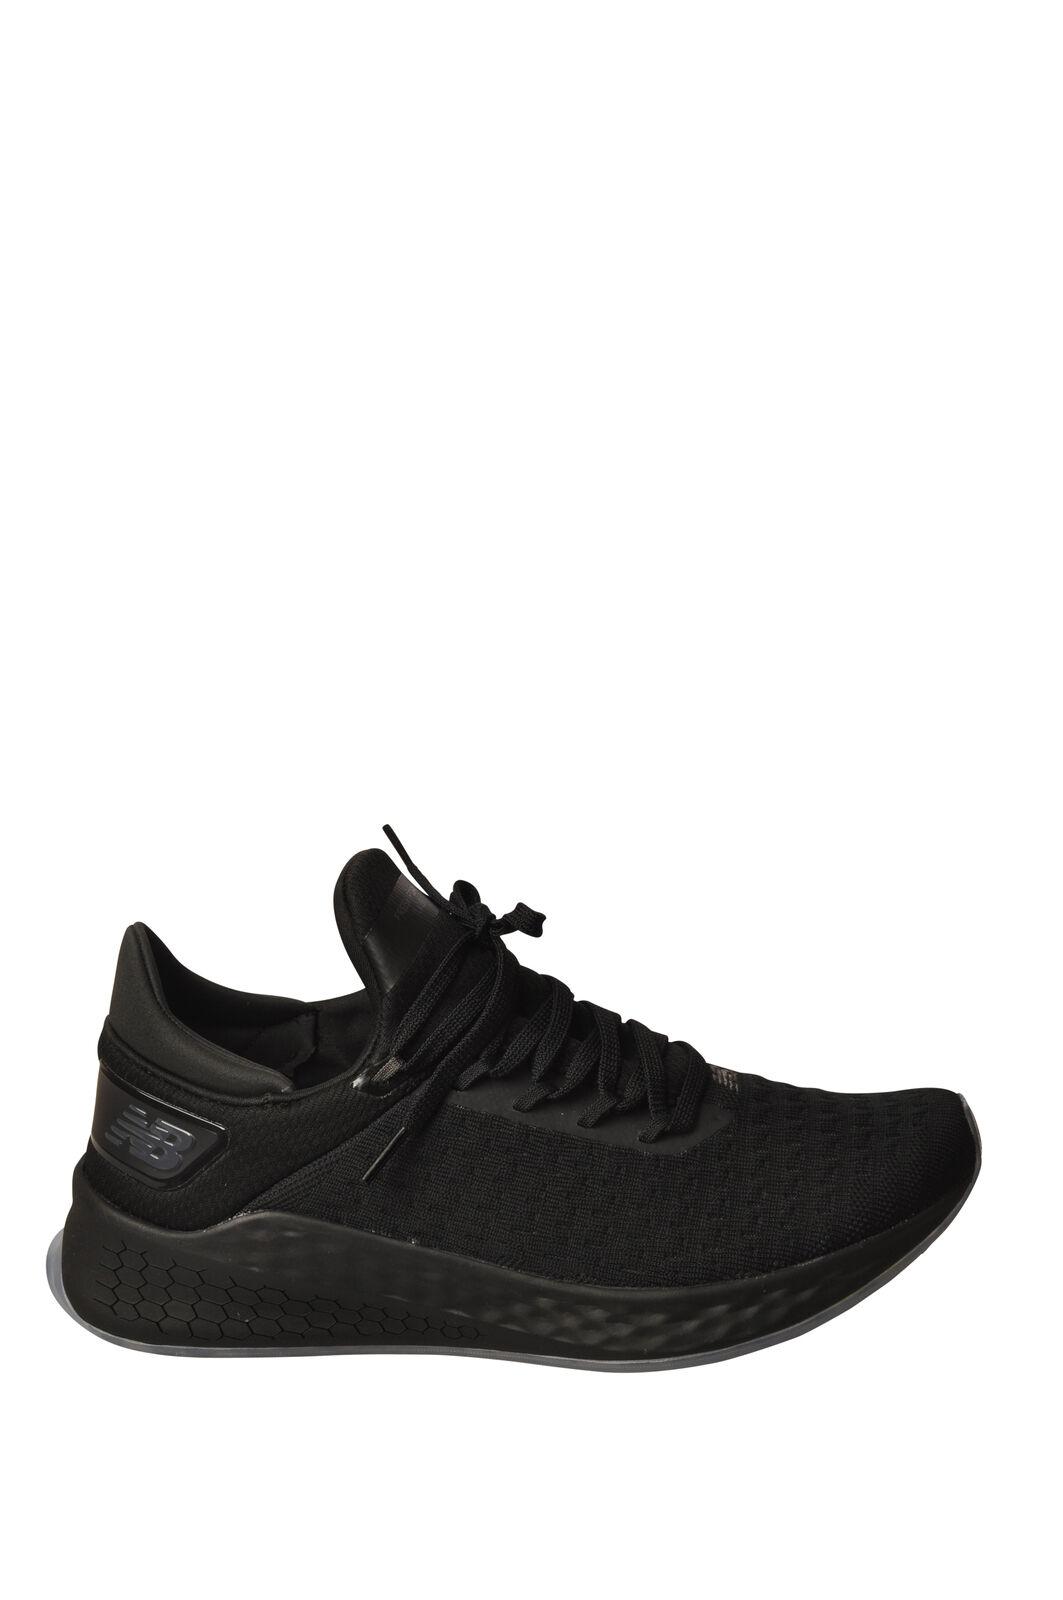 New Balance - zapatos-Lace Up - Man - negro - 6211330C191211